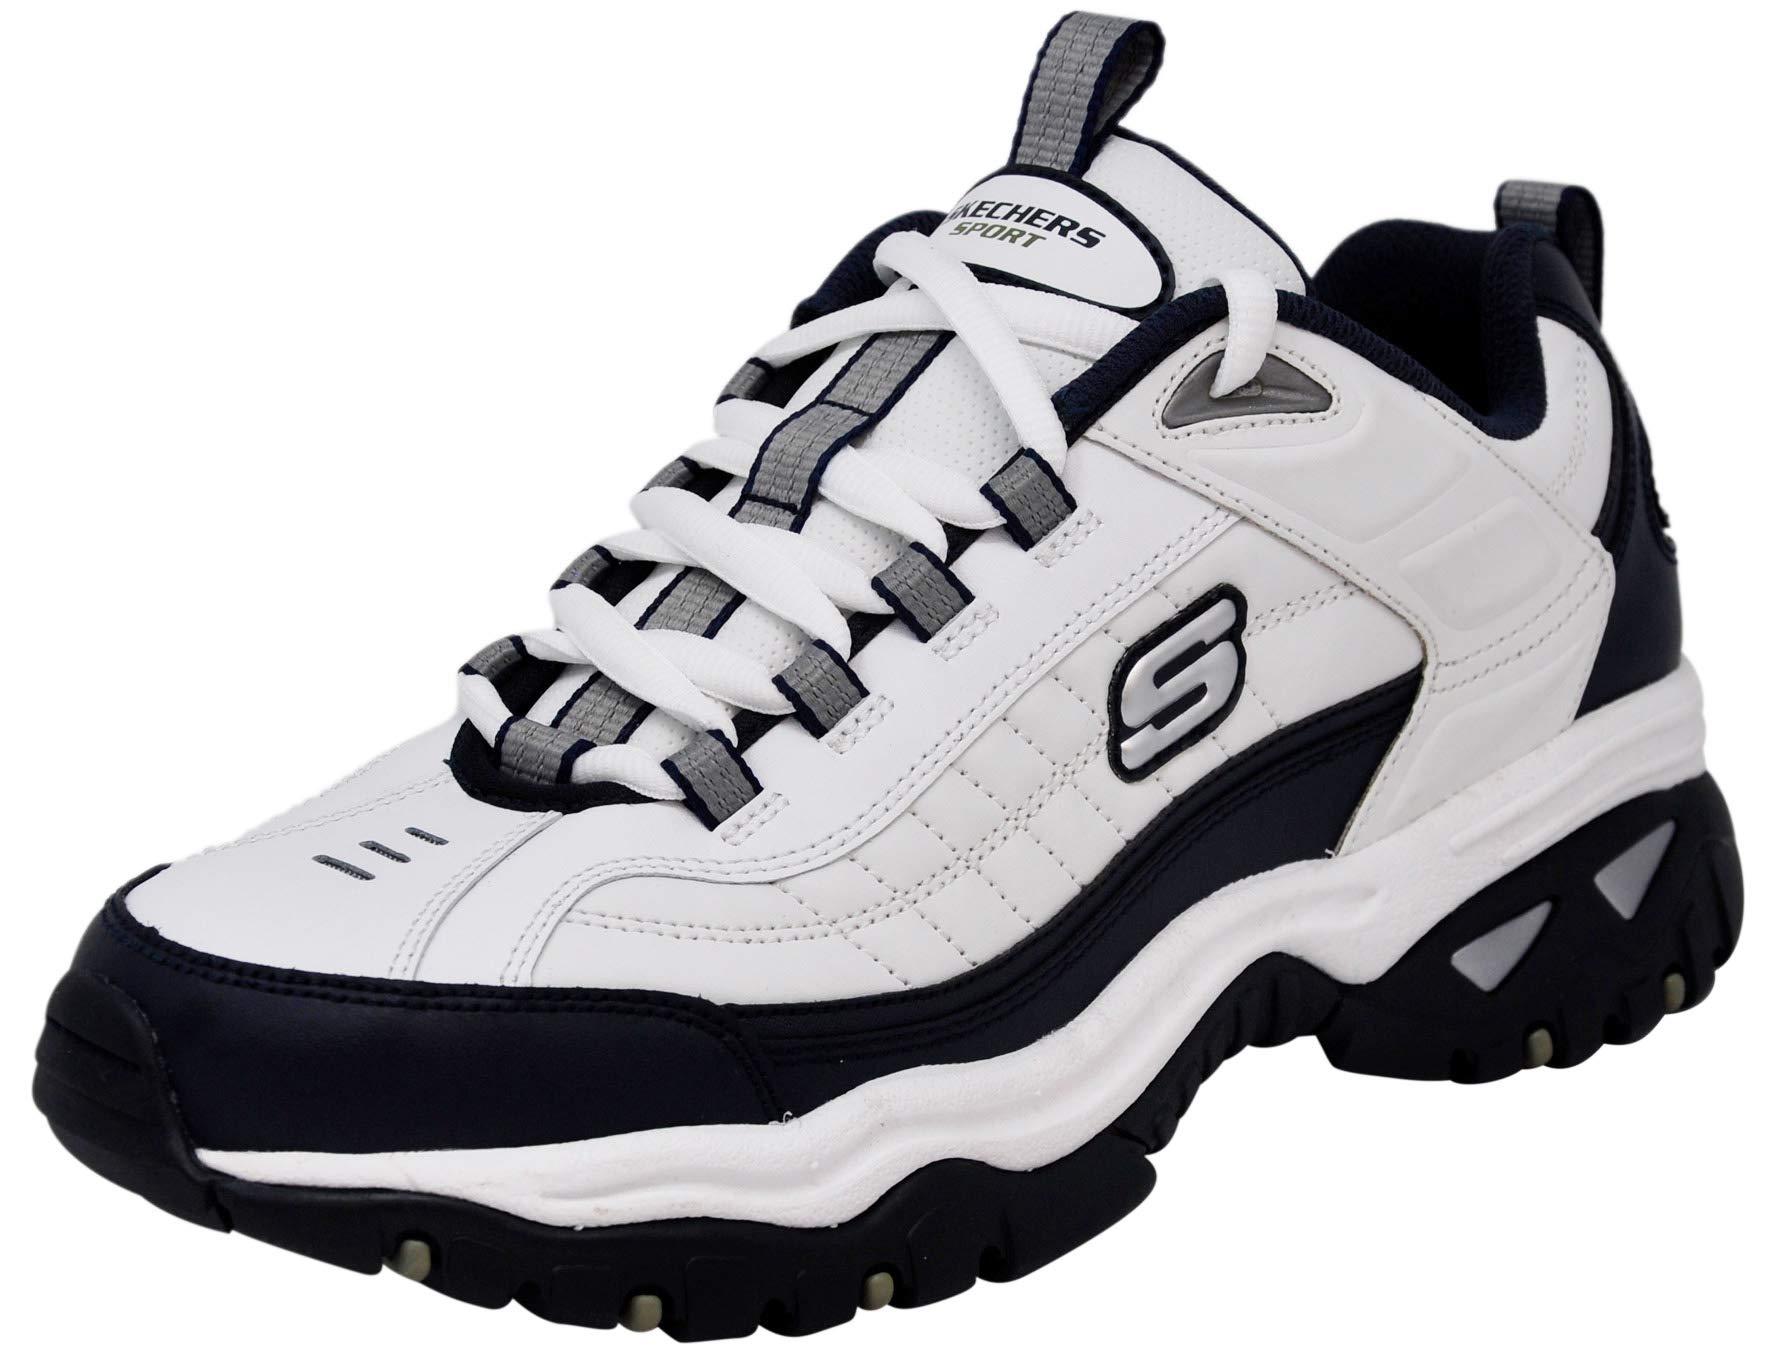 Skechers Men's Energy Afterburn Lace-Up Sneaker, White/Navy Blue, 10 M US